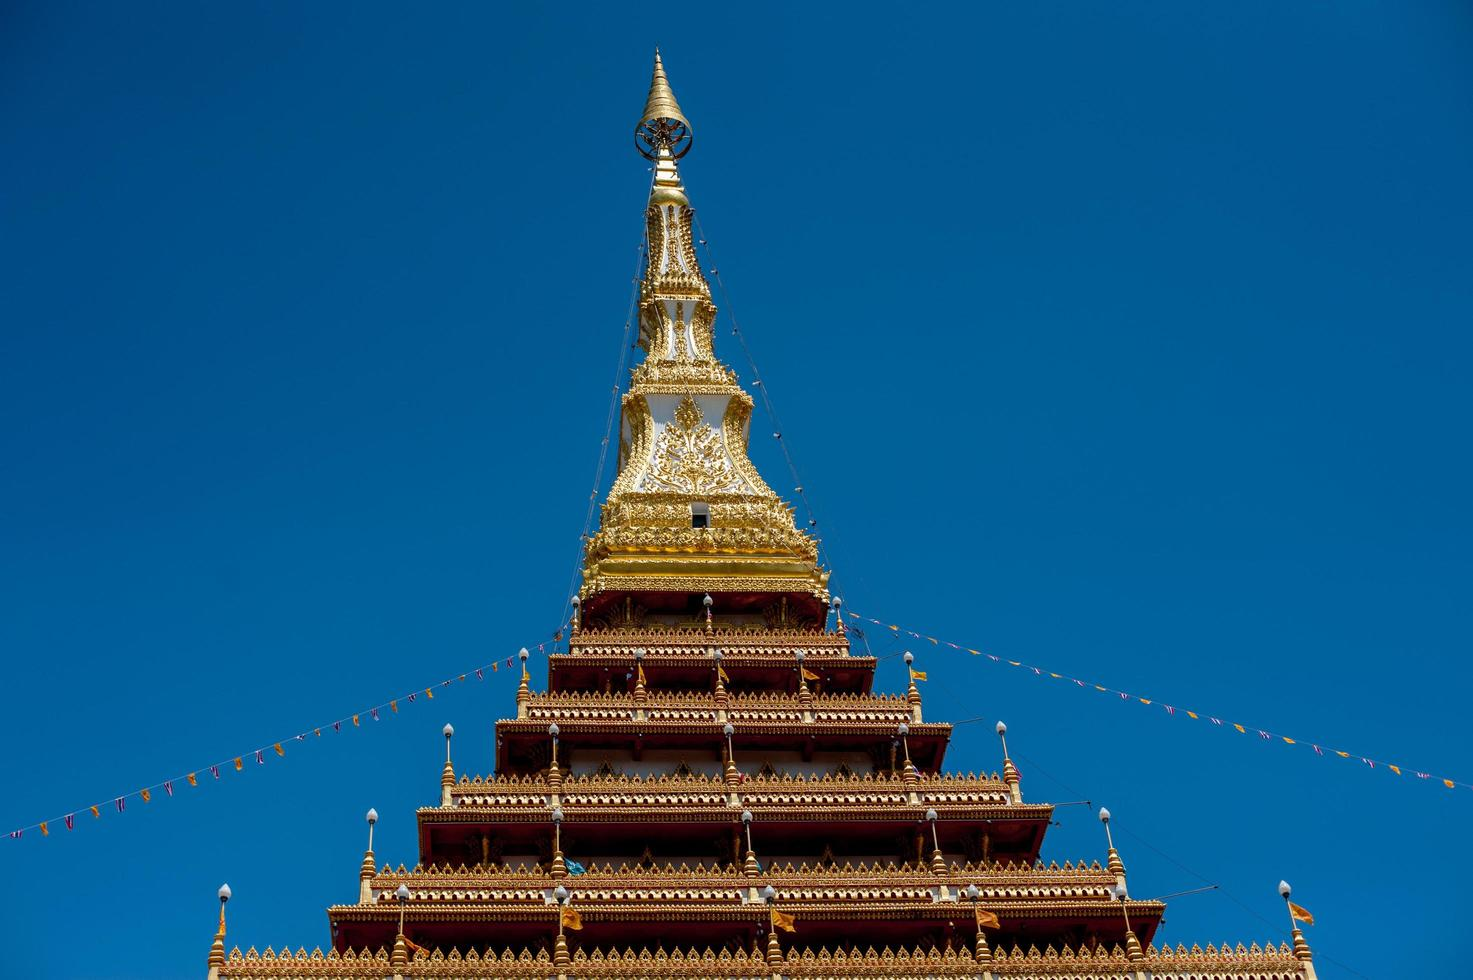 Templo en Tailandia Phra Mahathat Kaen Nakhon, provincia de Khon Kaen, Tailandia foto